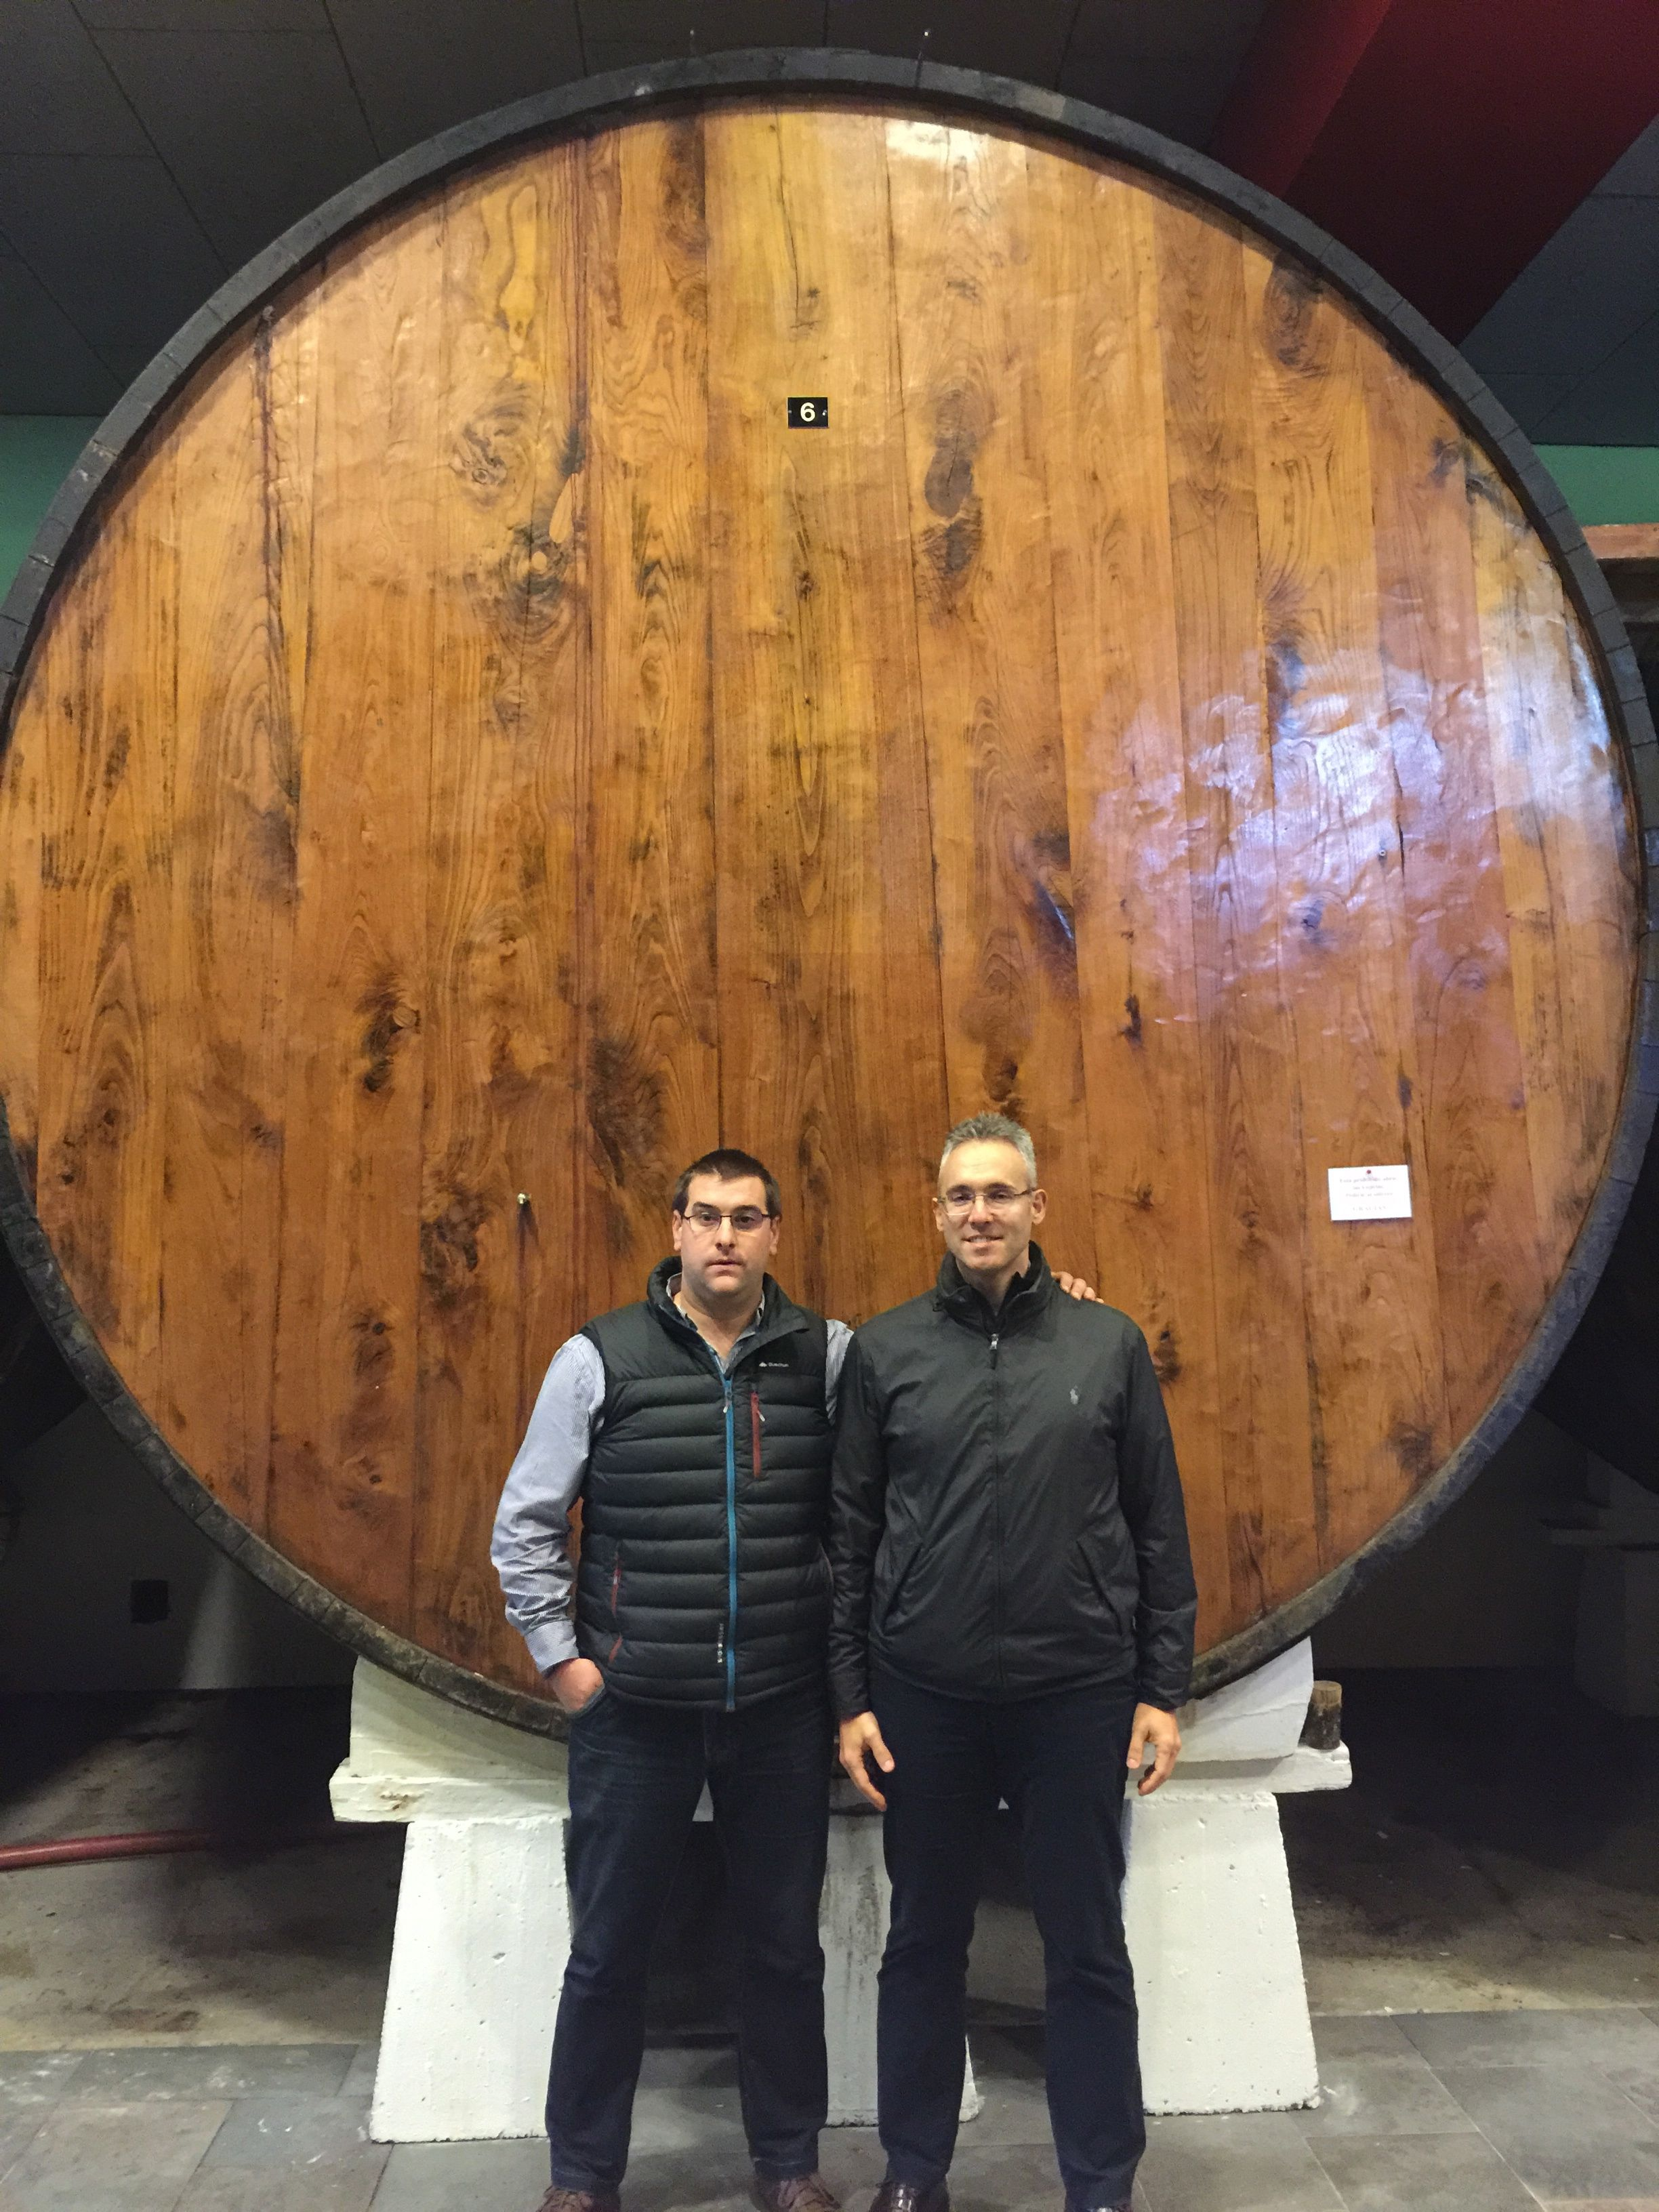 Aitor Bereziartua, Cider Maker and Florencio